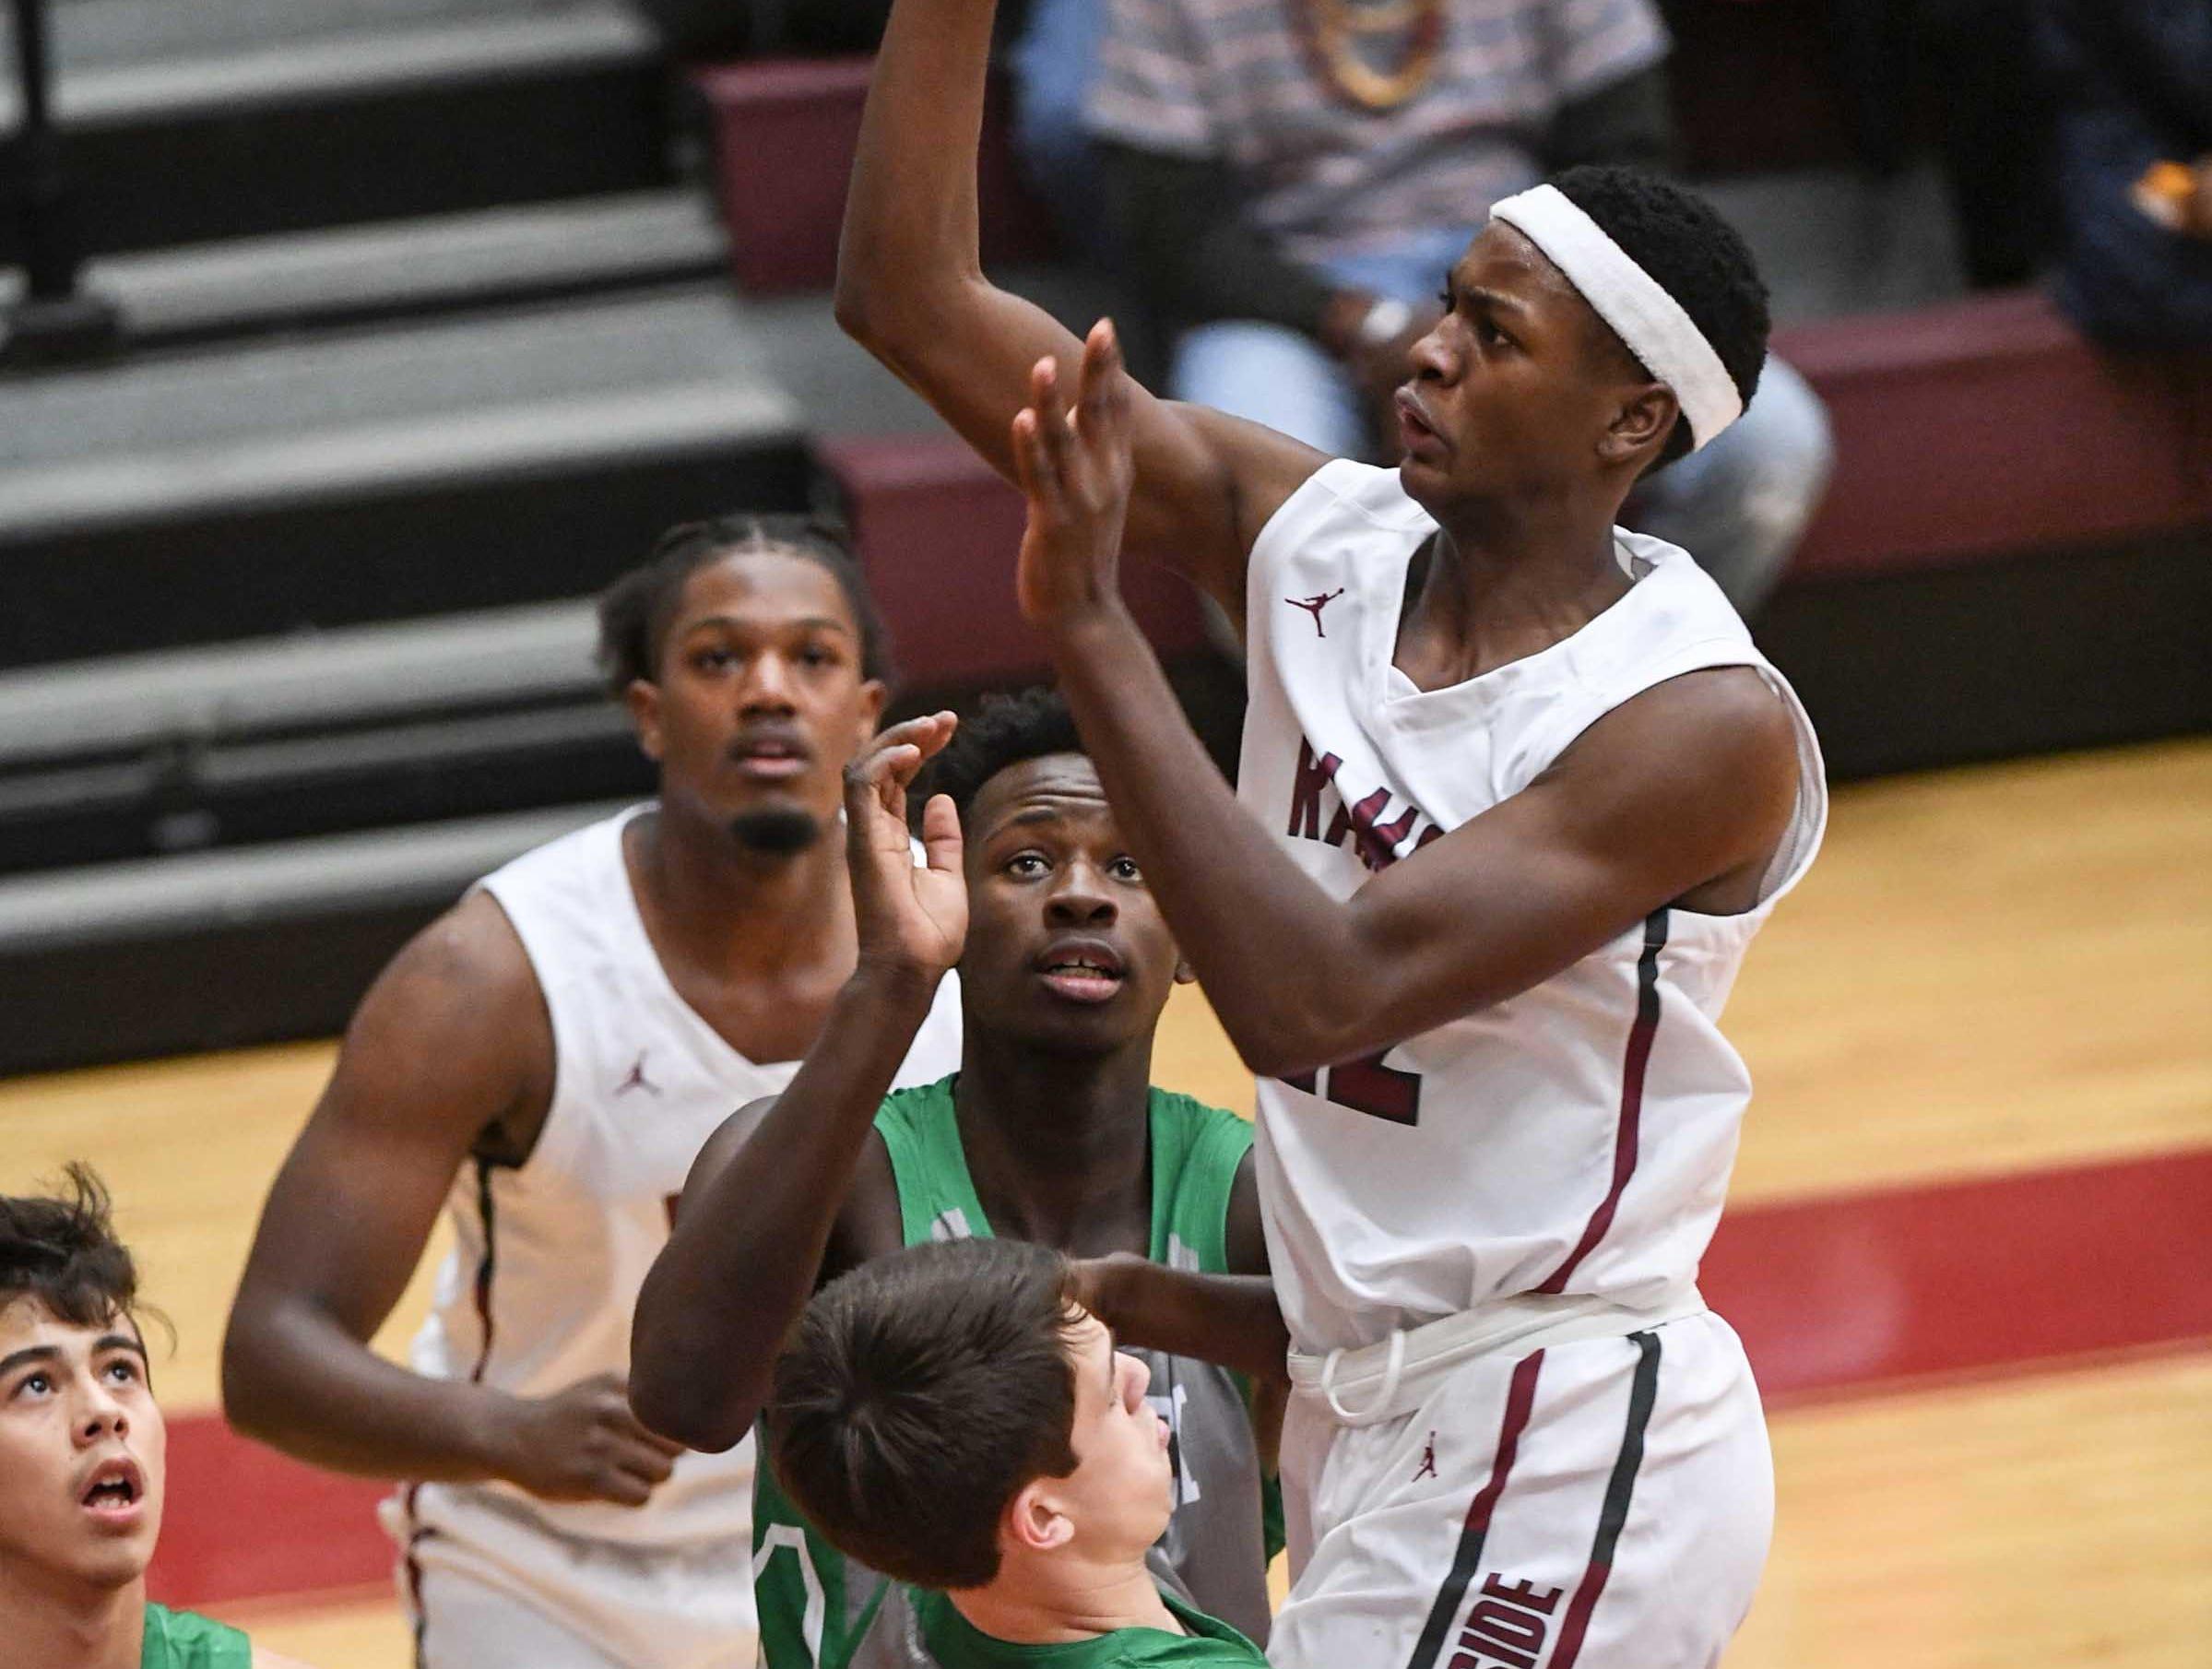 Westside sophomore Xavier Thornton(22) shoots near Easley senior Rett Lister(4) during the first quarter at Westside High School in Anderson on Friday.